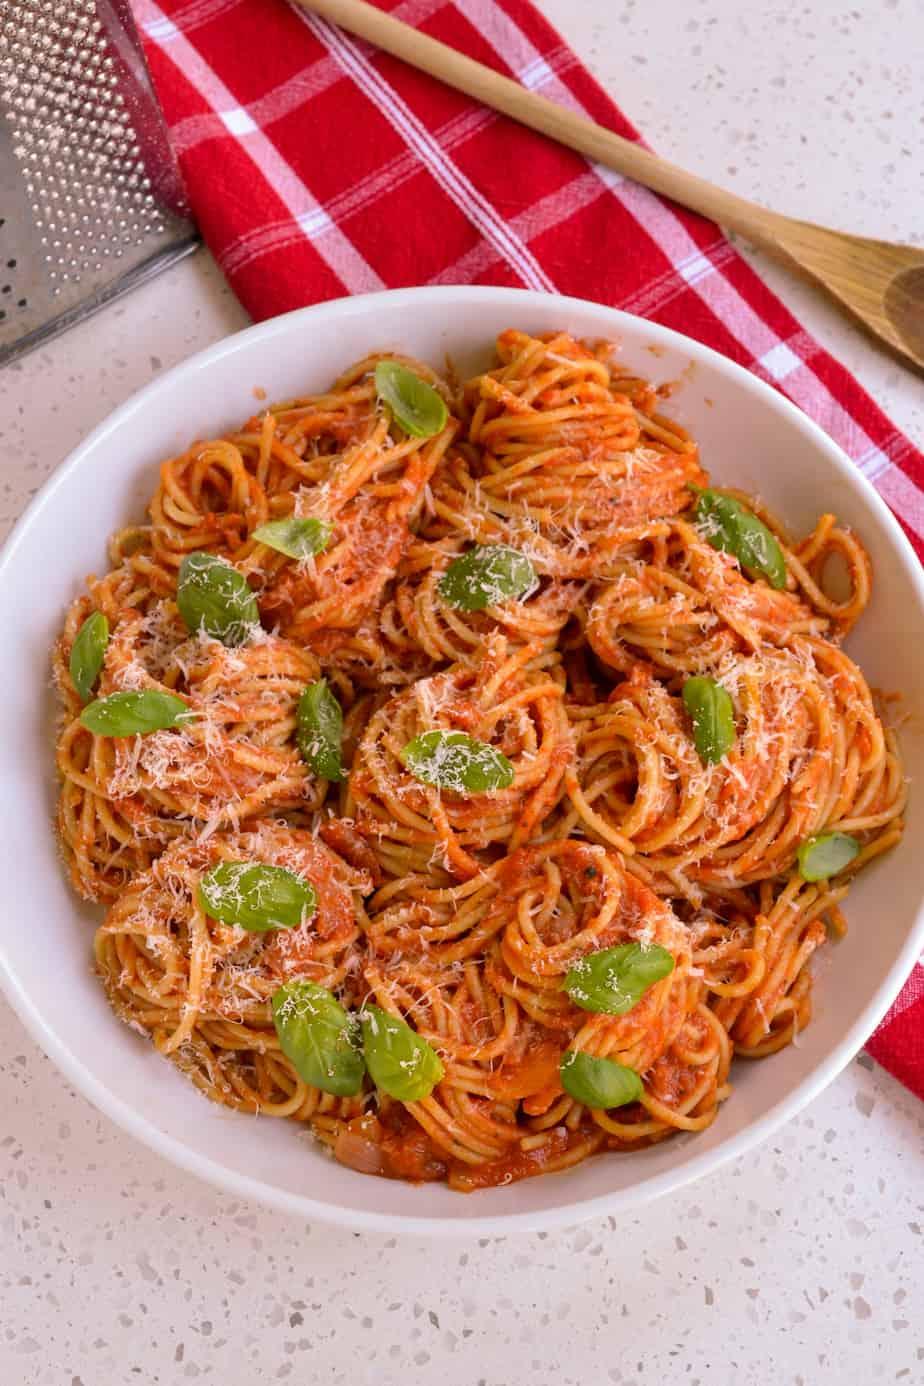 A bowl full of Pasta Pomodoro